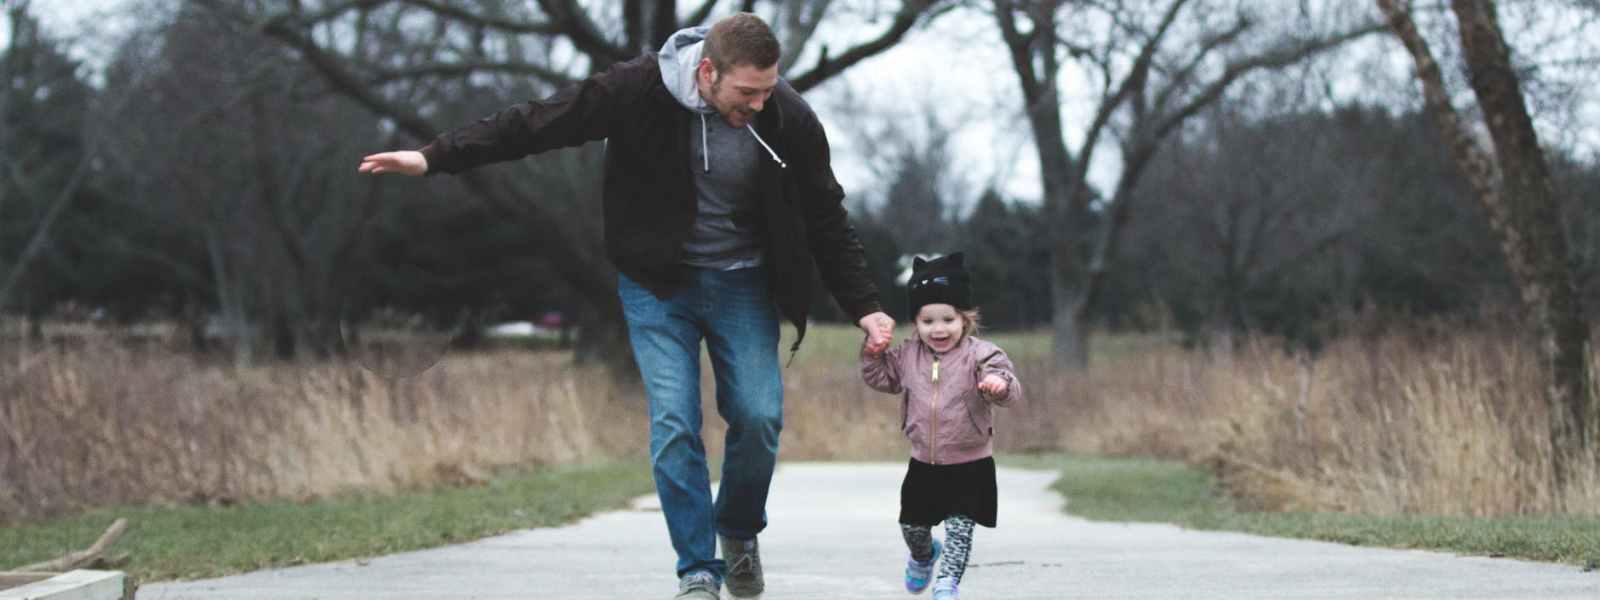 man and girl running on asphalt road